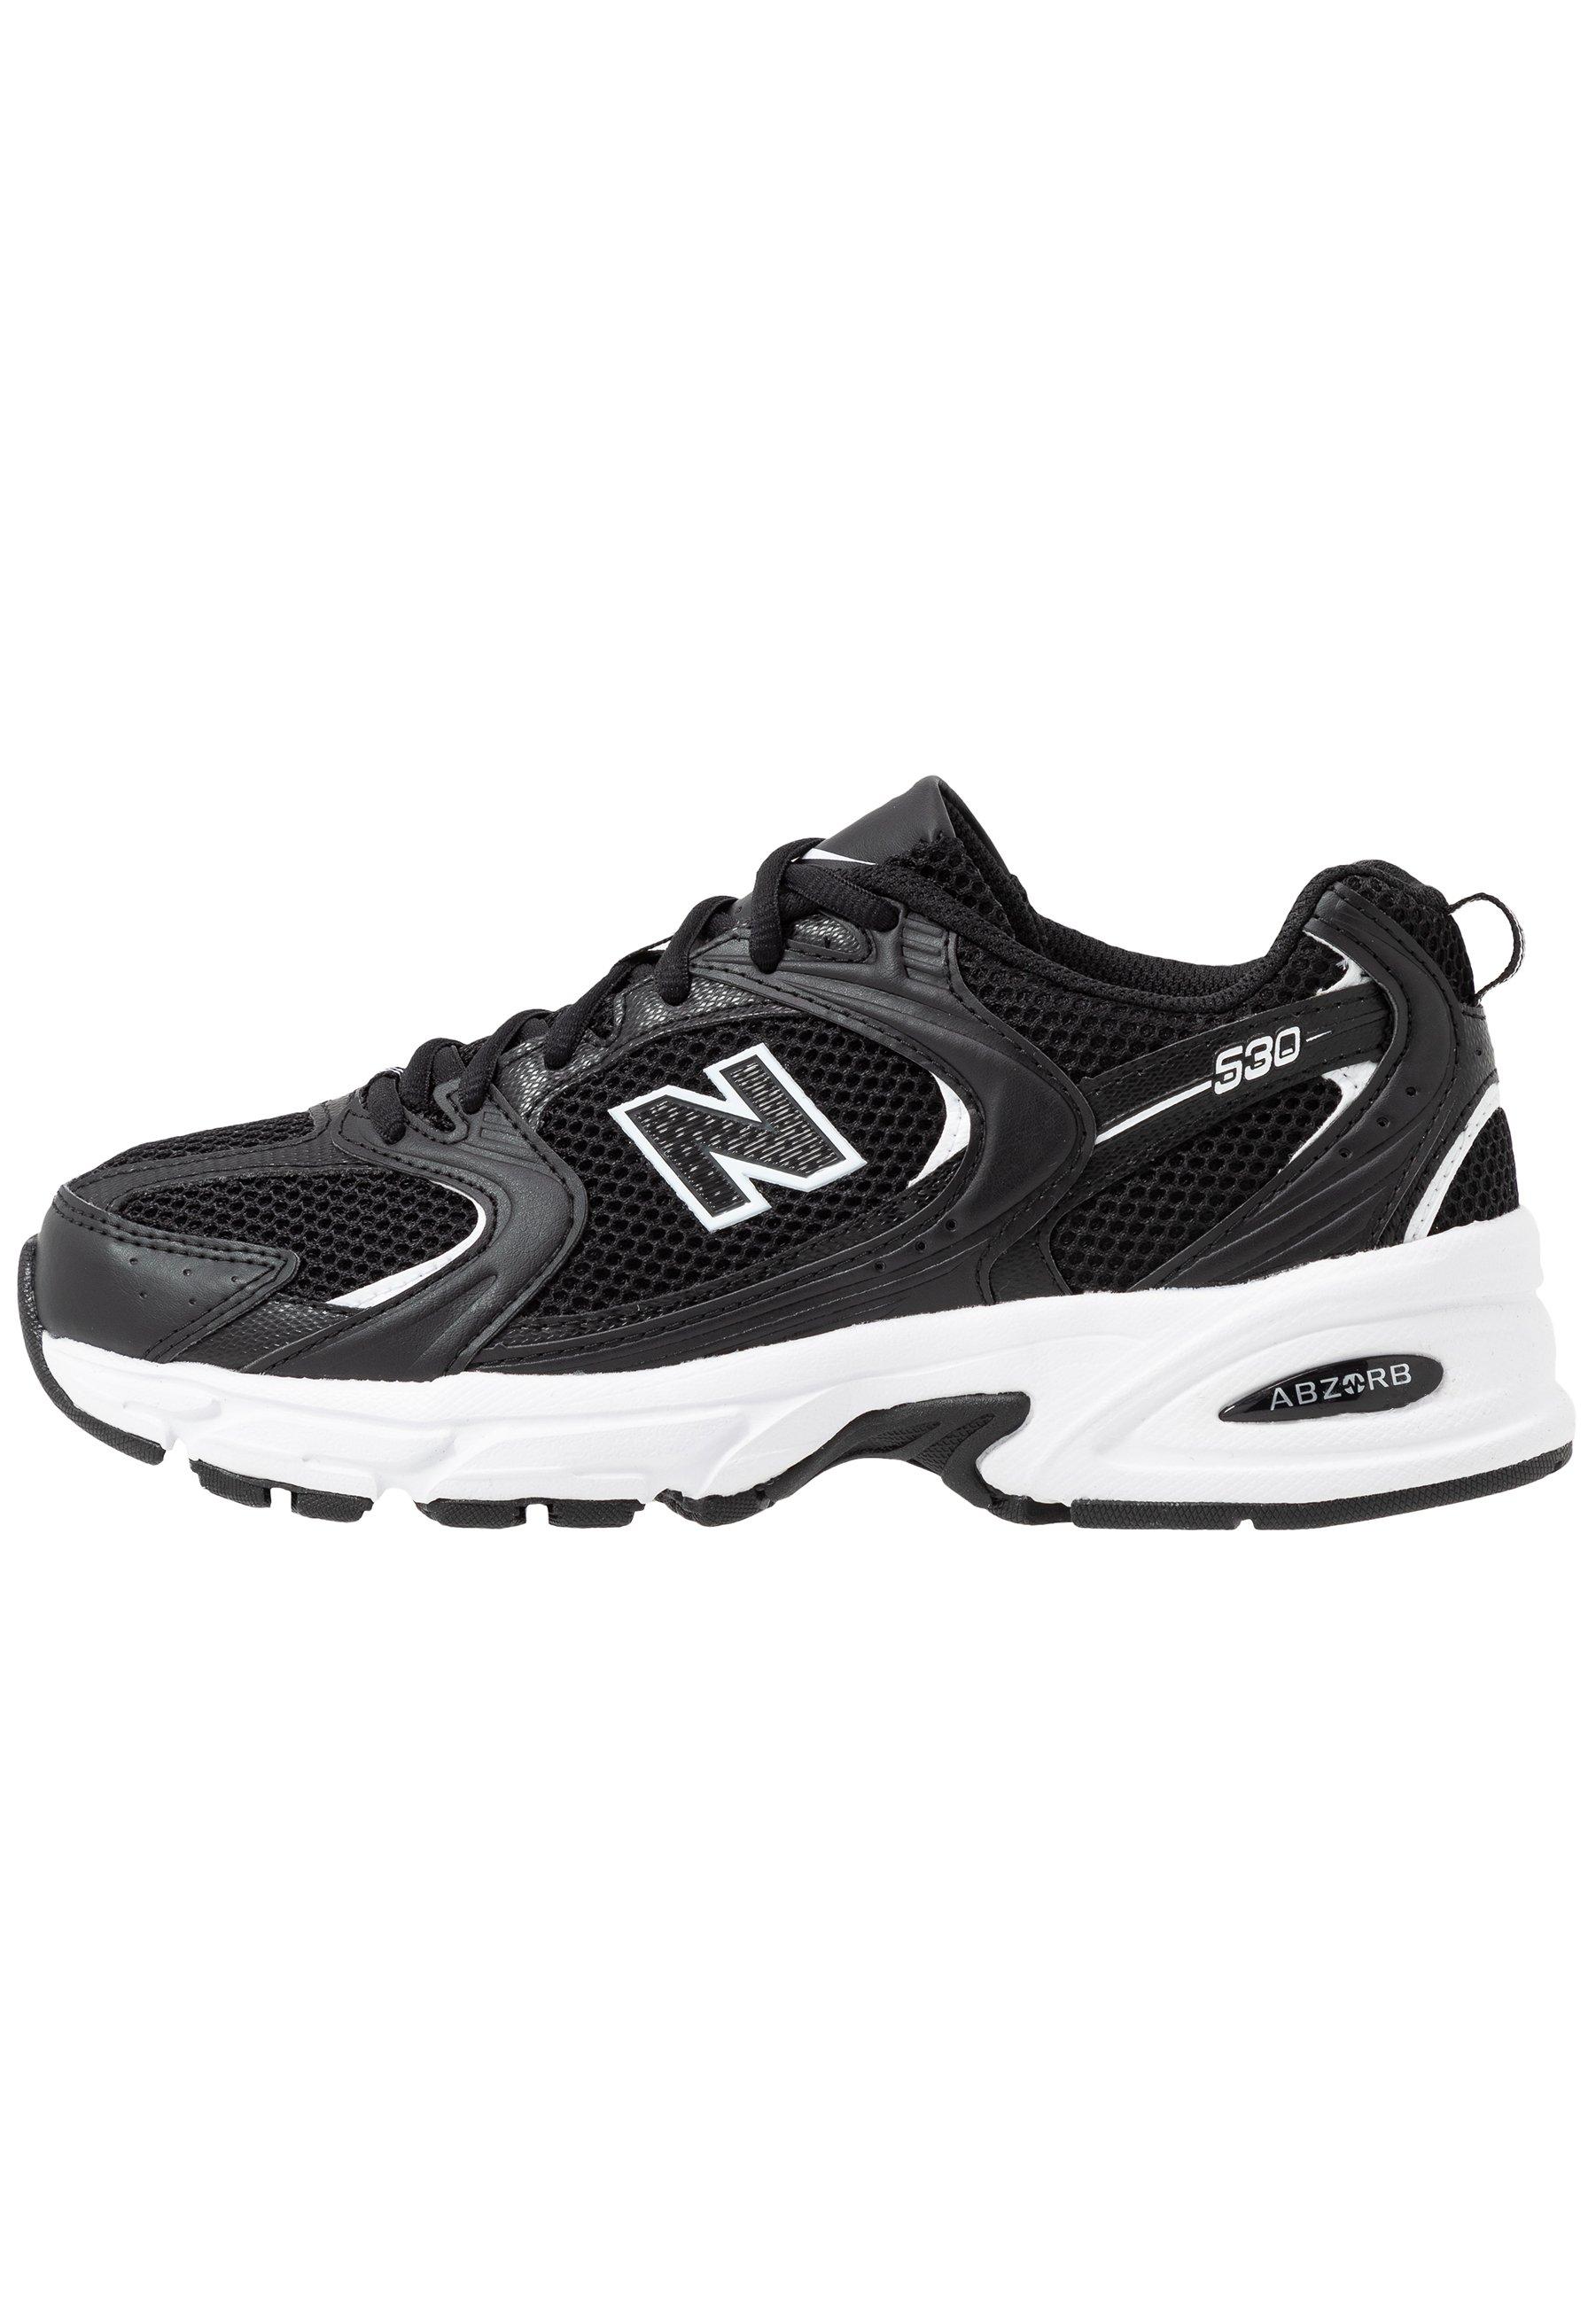 New Balance Sneakers basse - black/nero - Zalando.it